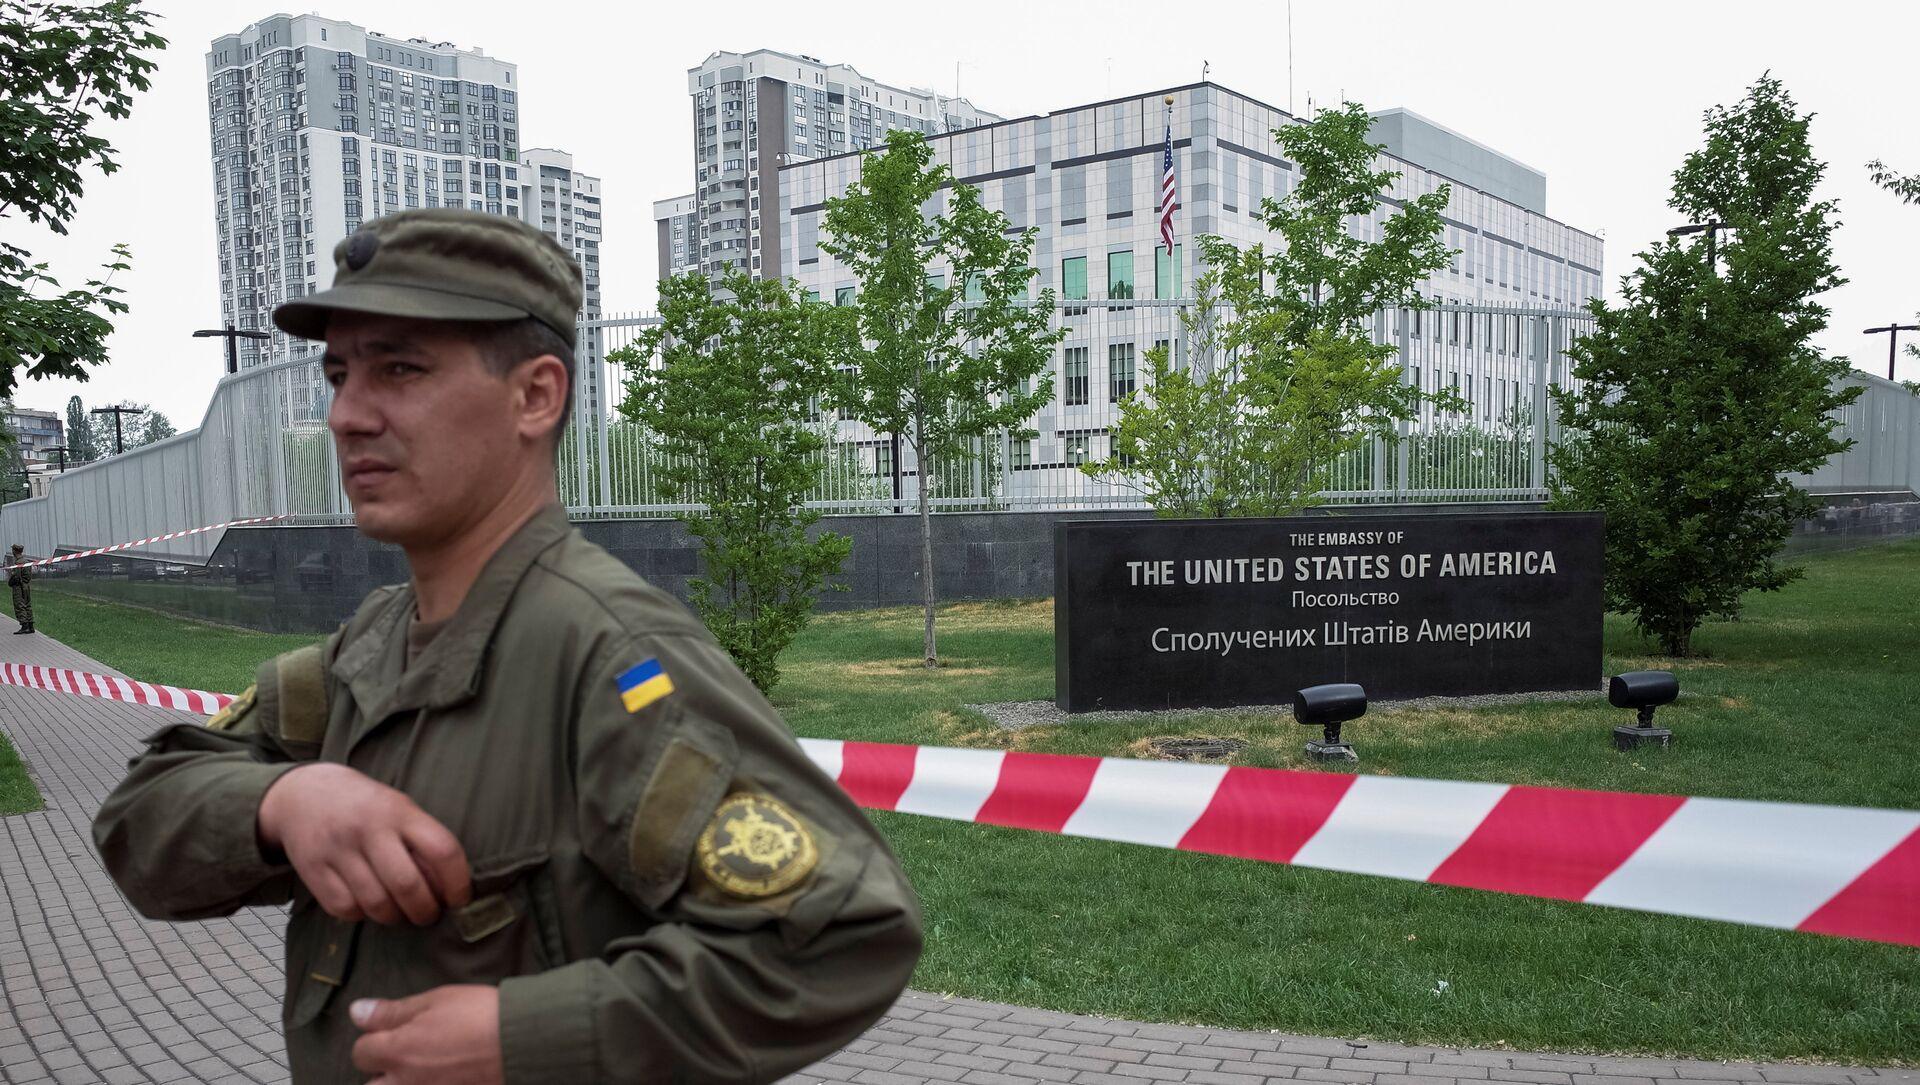 A member of the National Guard stands guard in front of the U.S. embassy in Kiev, Ukraine, June 8, 2017. - Sputnik International, 1920, 05.09.2021